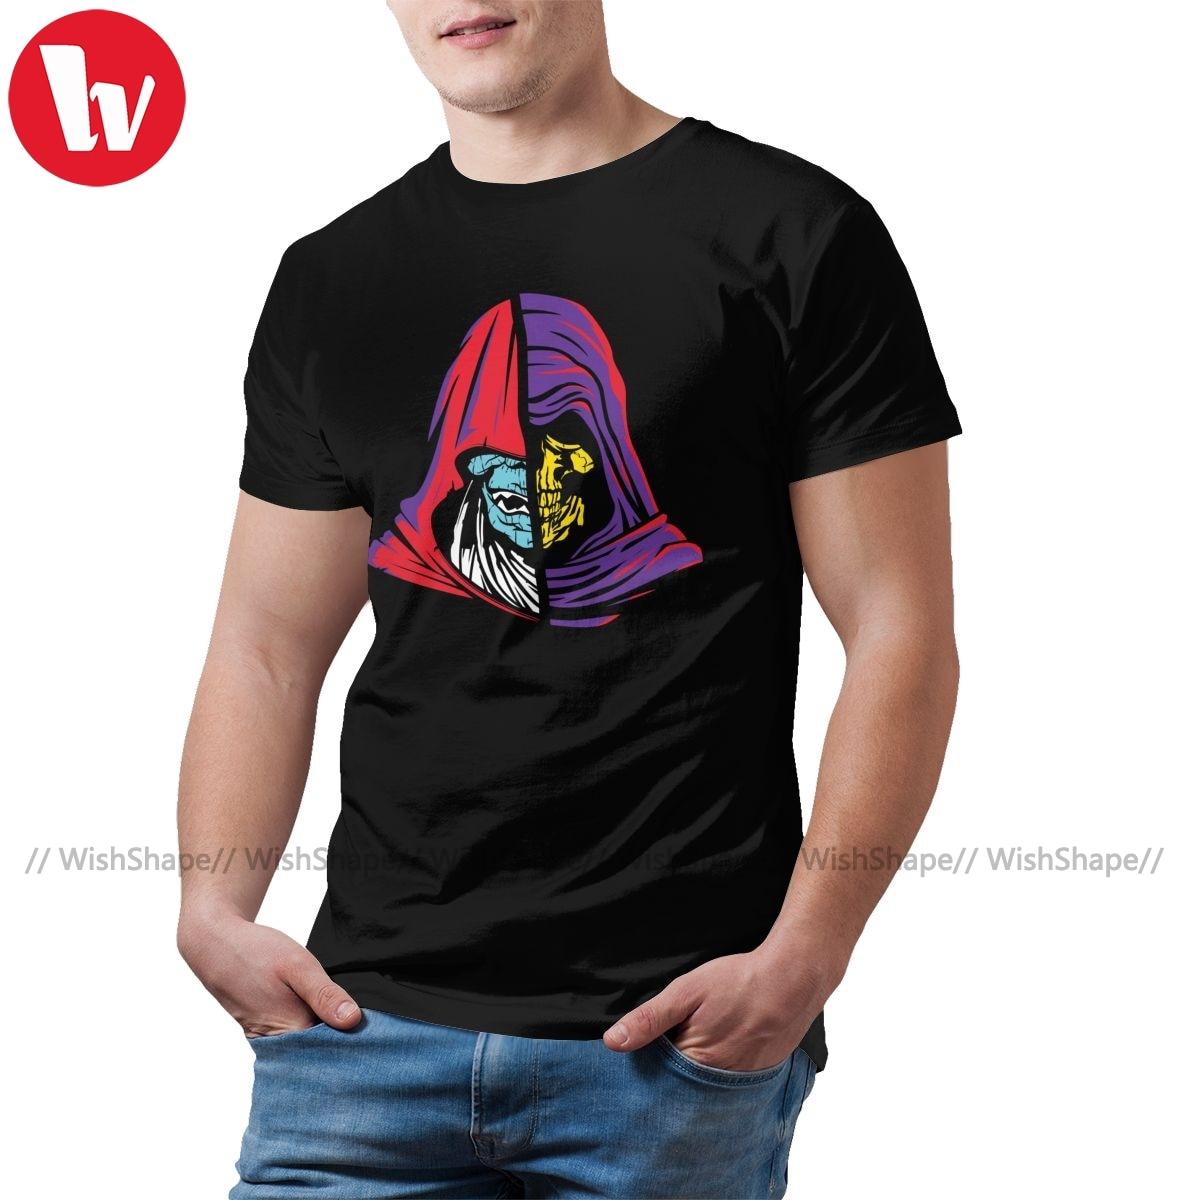 Camiseta Thundercats con capucha ancestral del mal, camiseta 100 de algodón con gráfico, camiseta, camiseta manga corta